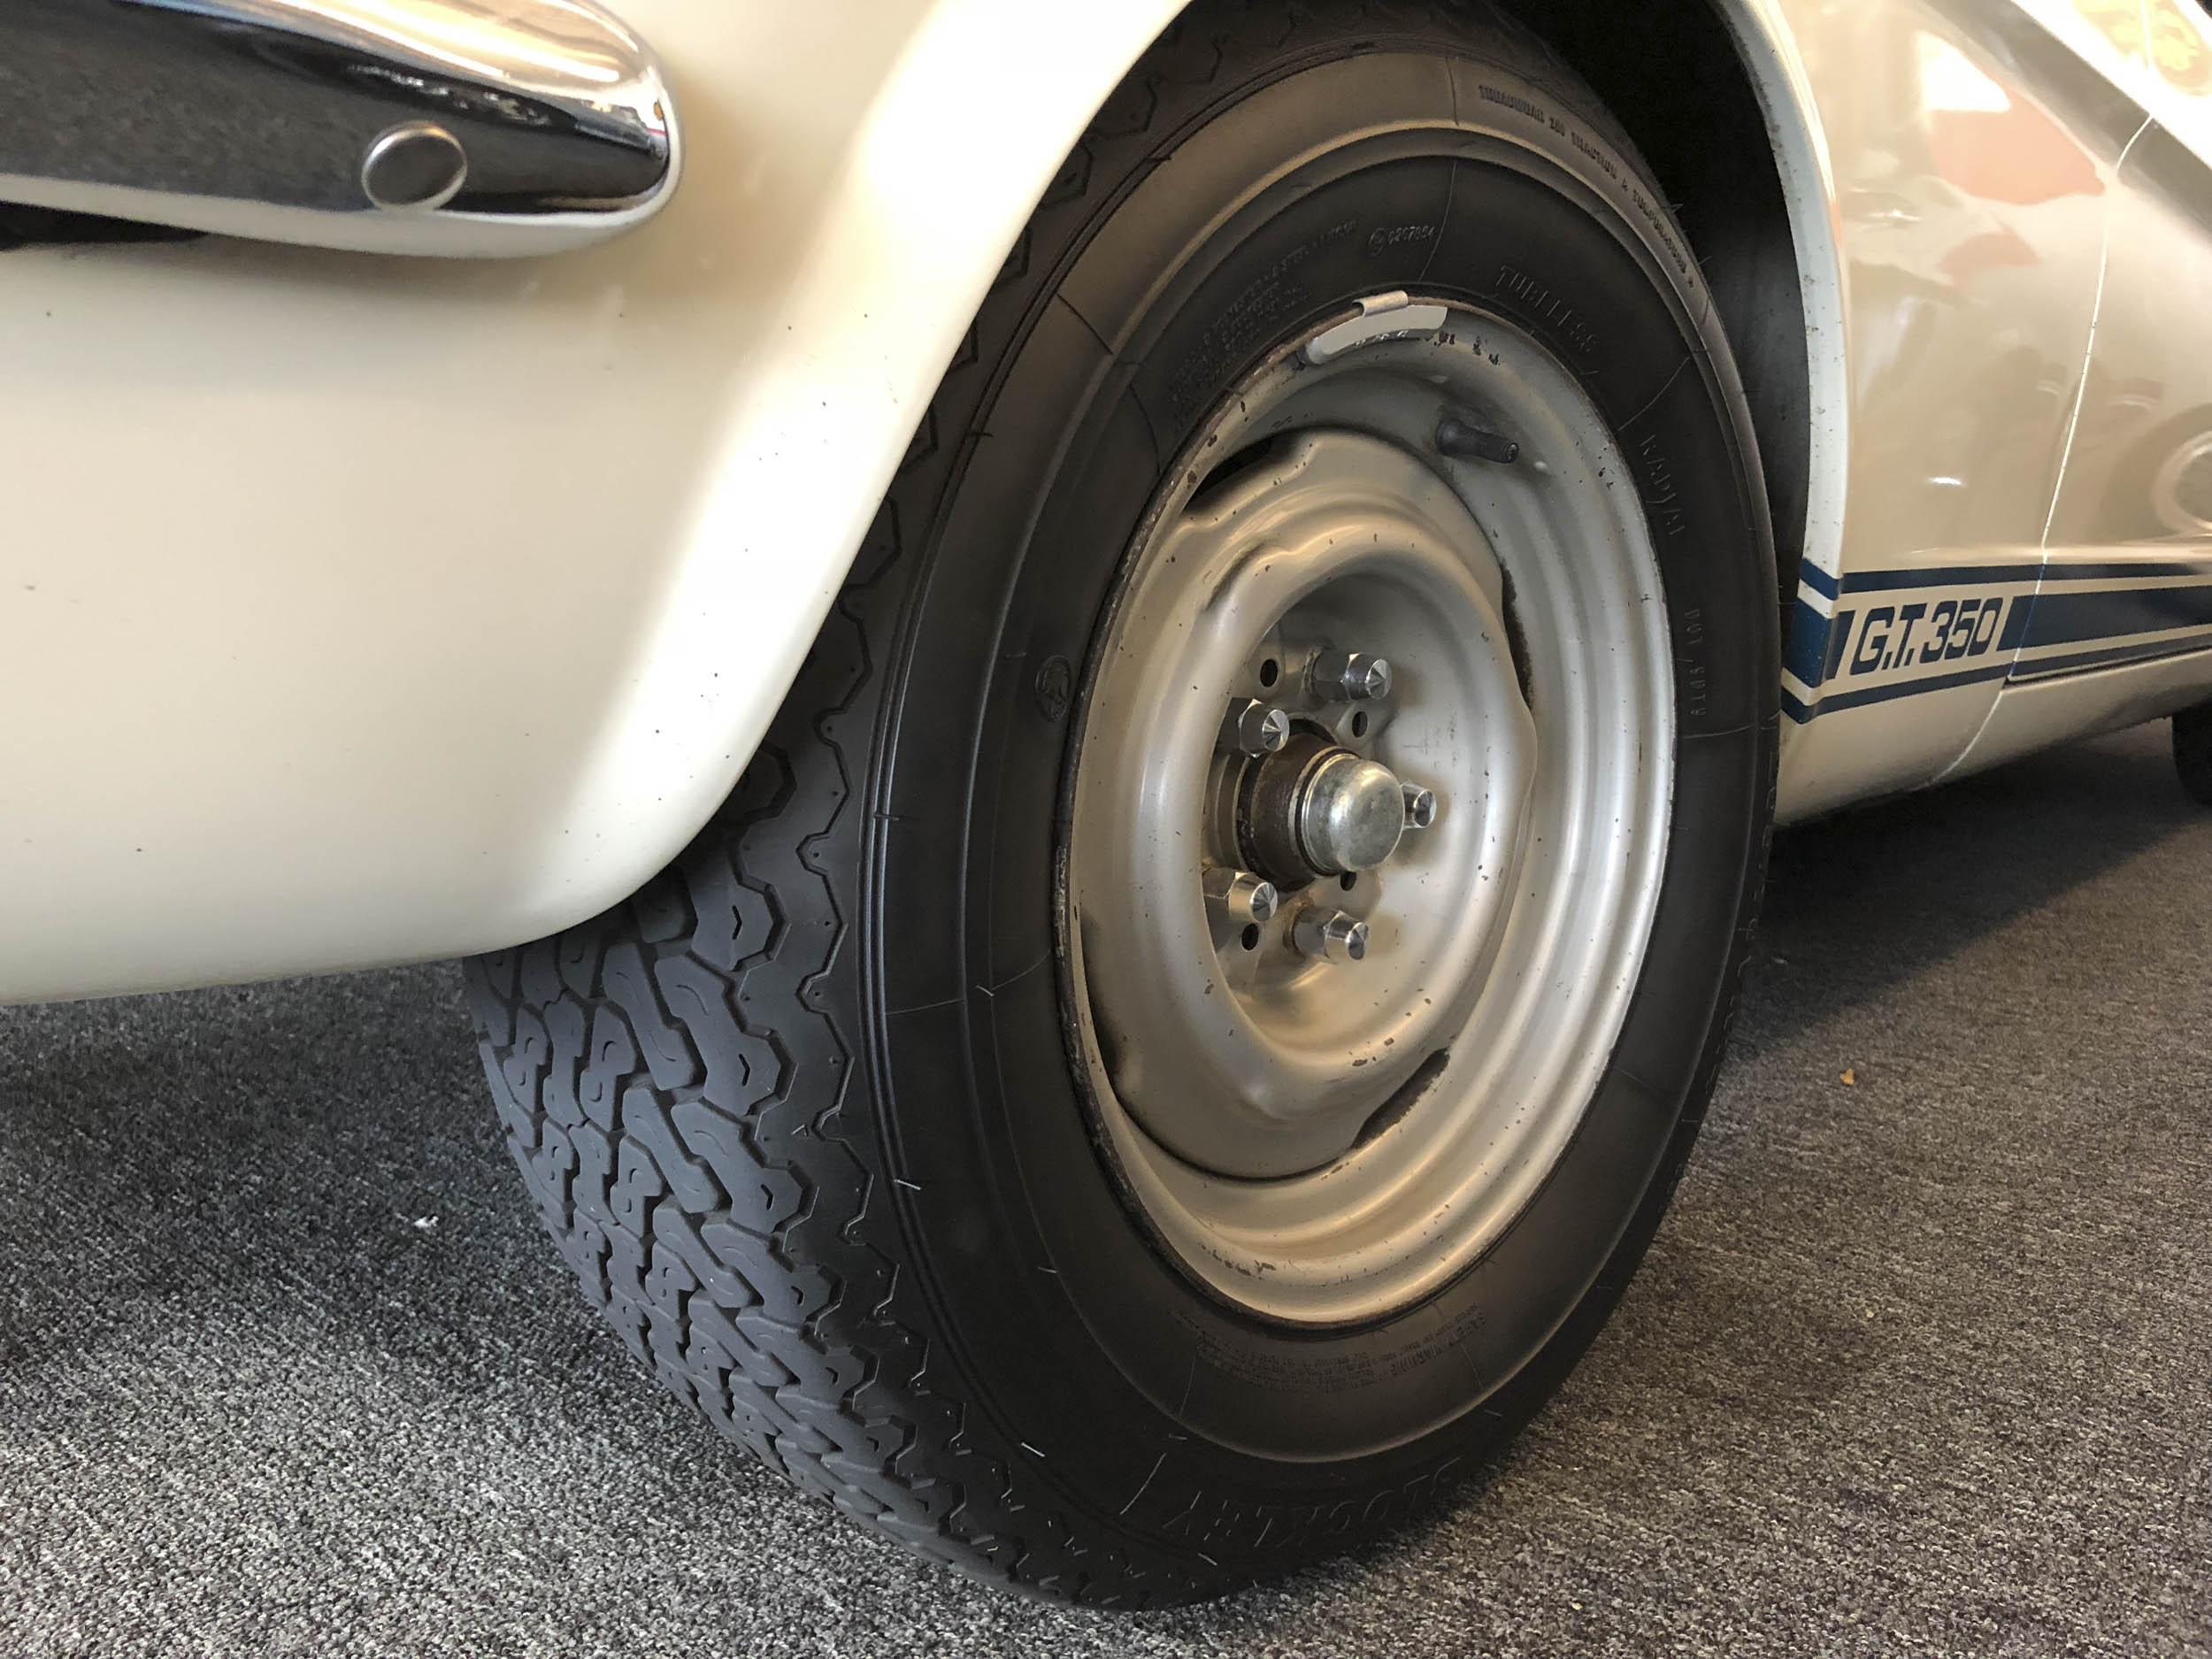 Modern rubber tires